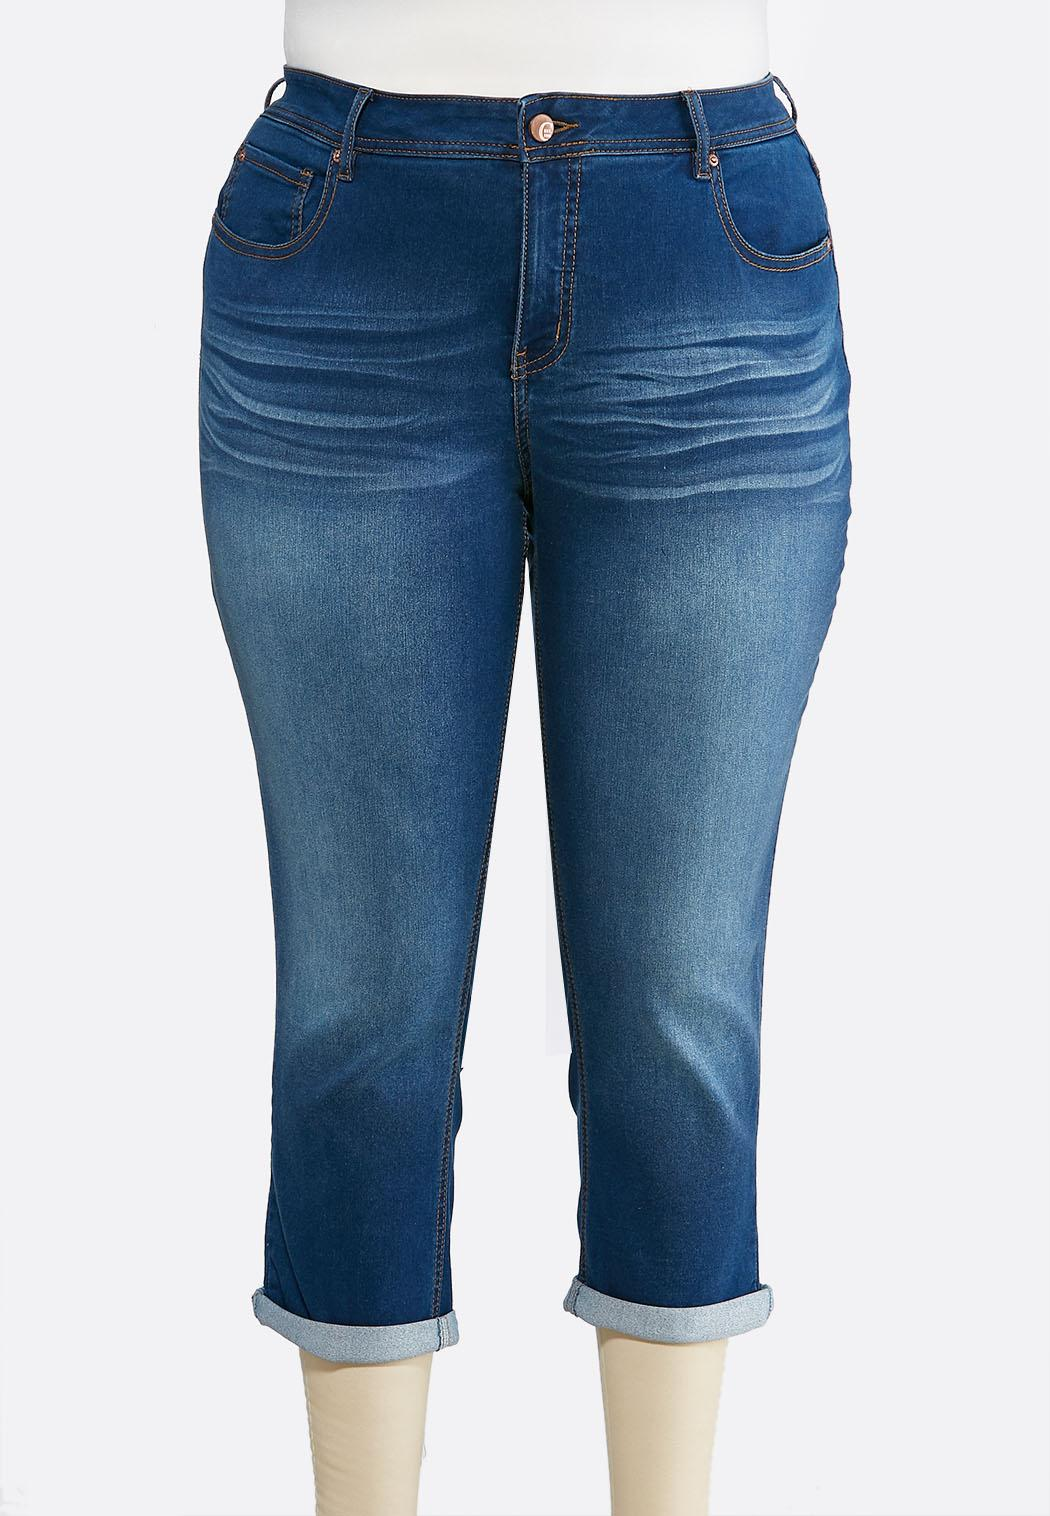 Plus Size Flattering Skinny Jeans